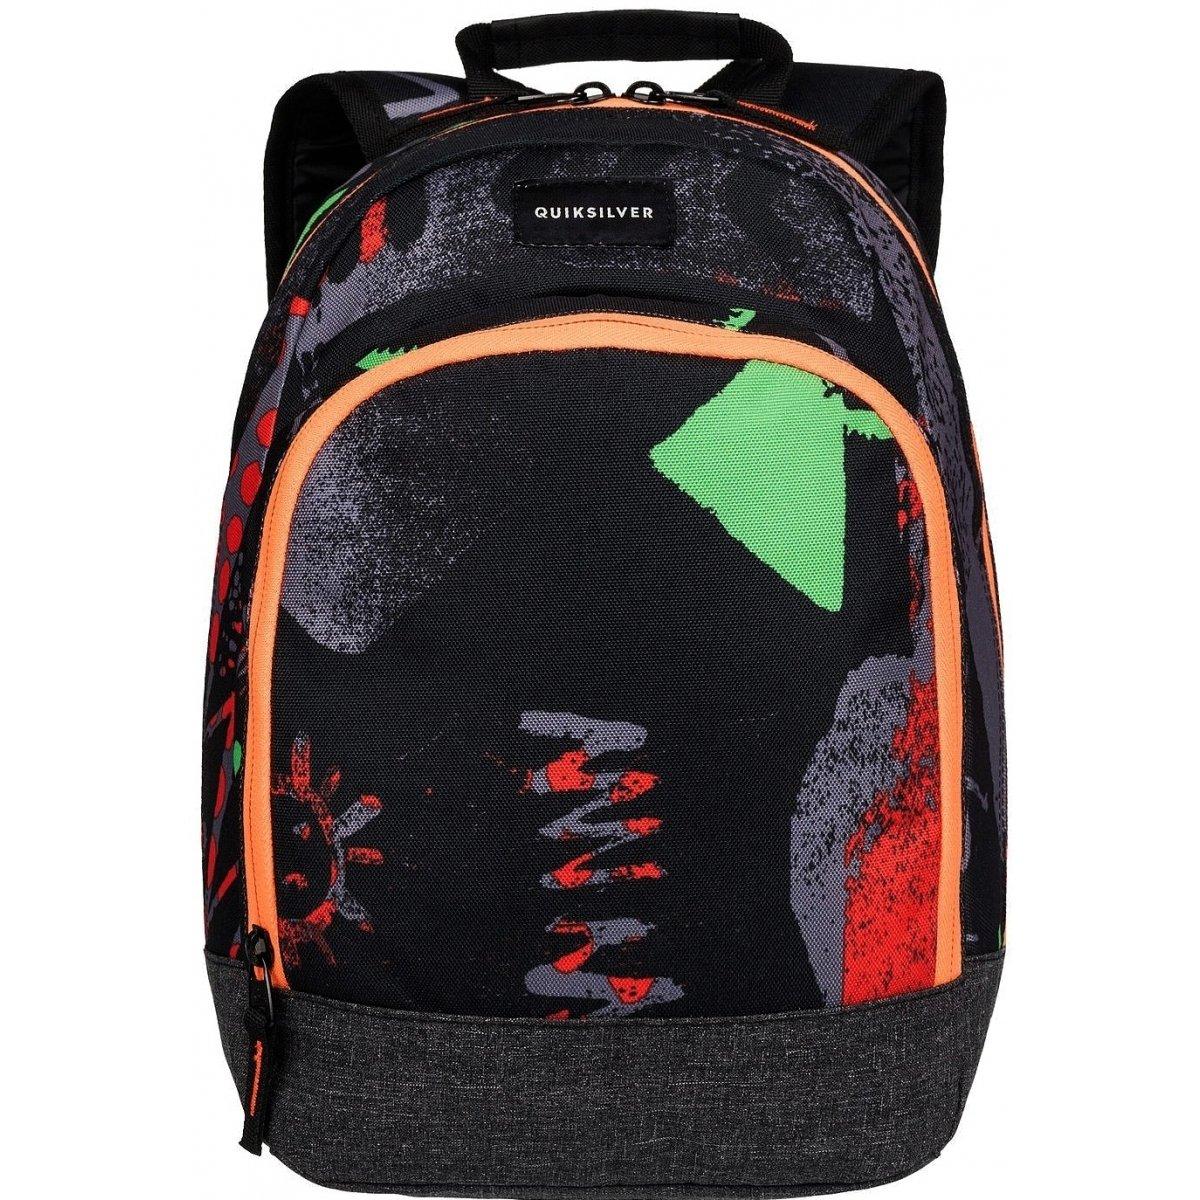 Quiksilver Chompine - Medium Backpack - Mochila Mediana - Chicos: Amazon.es: Equipaje